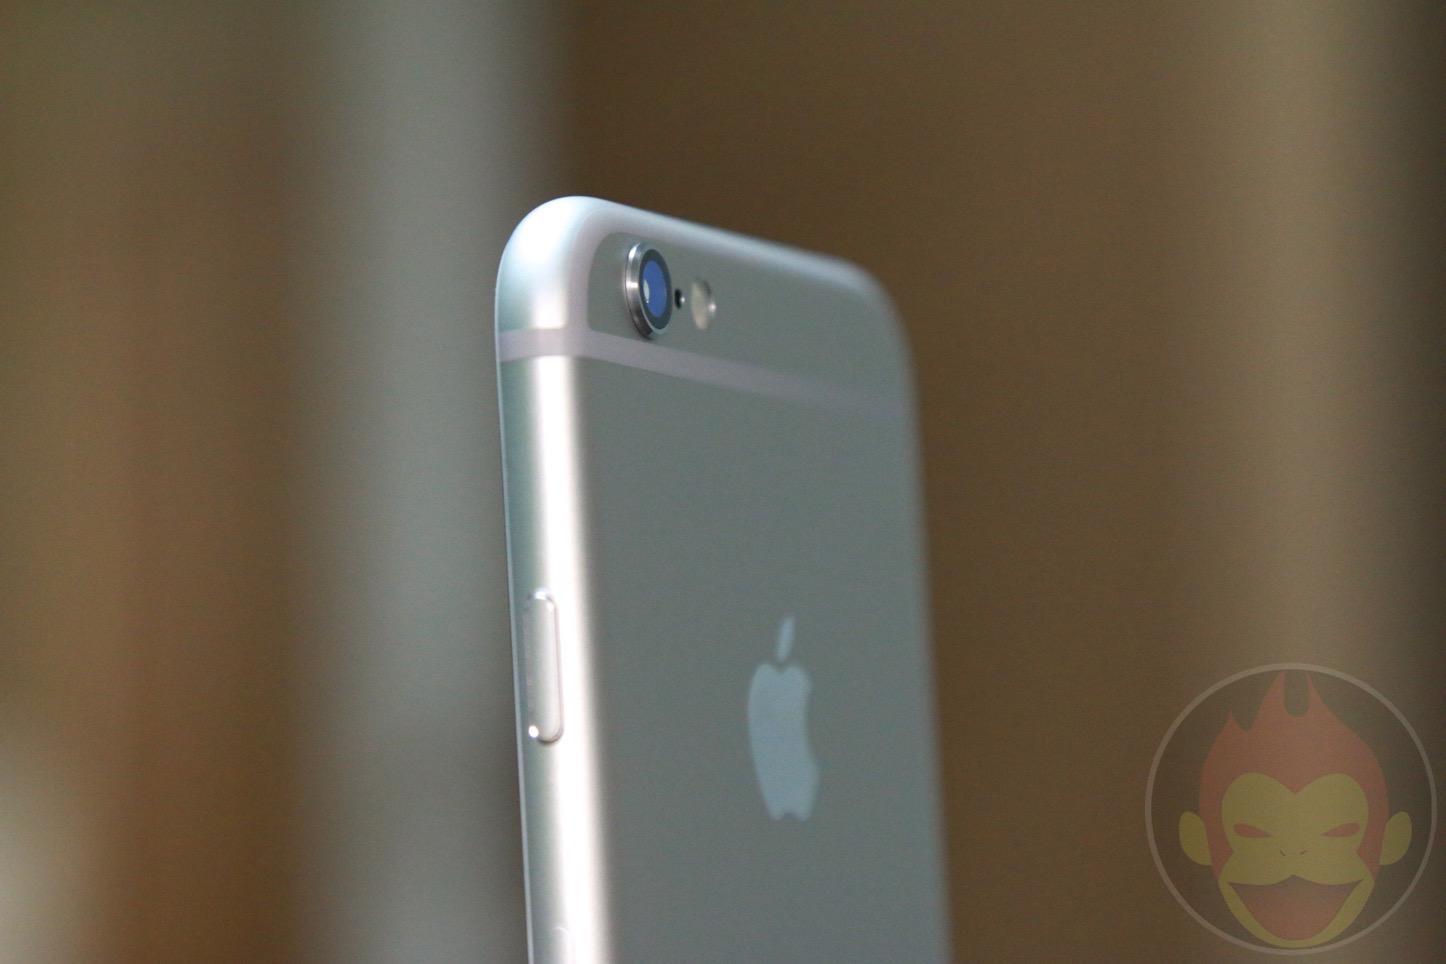 iPhone-6s-In-Depth-Review-05.jpg